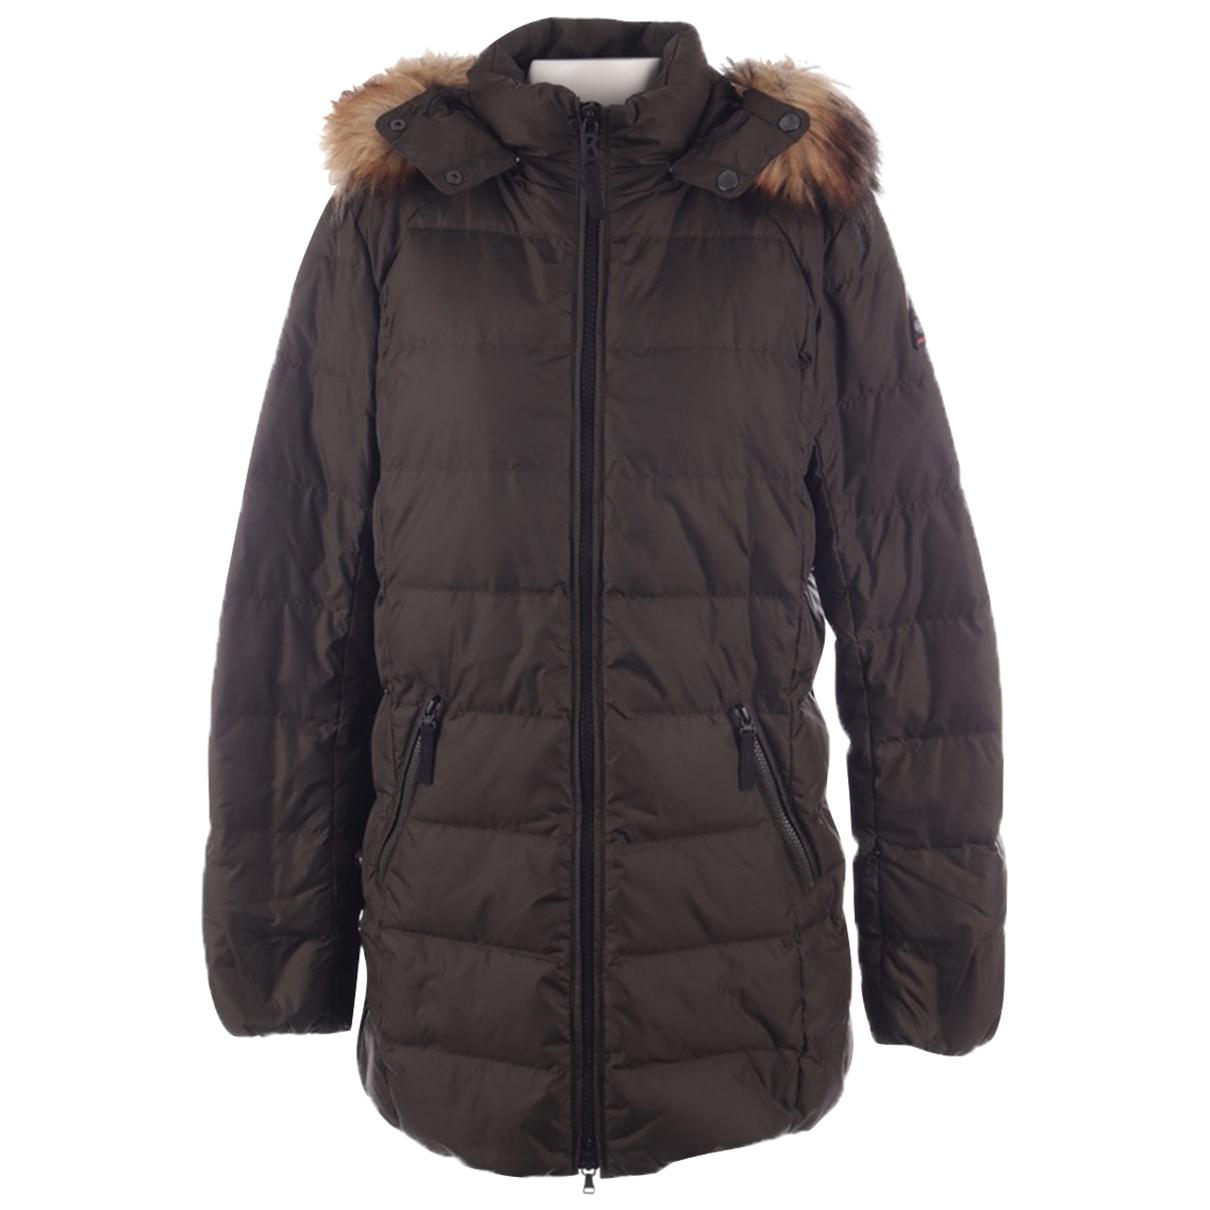 Bogner \N Green jacket for Women 36 FR